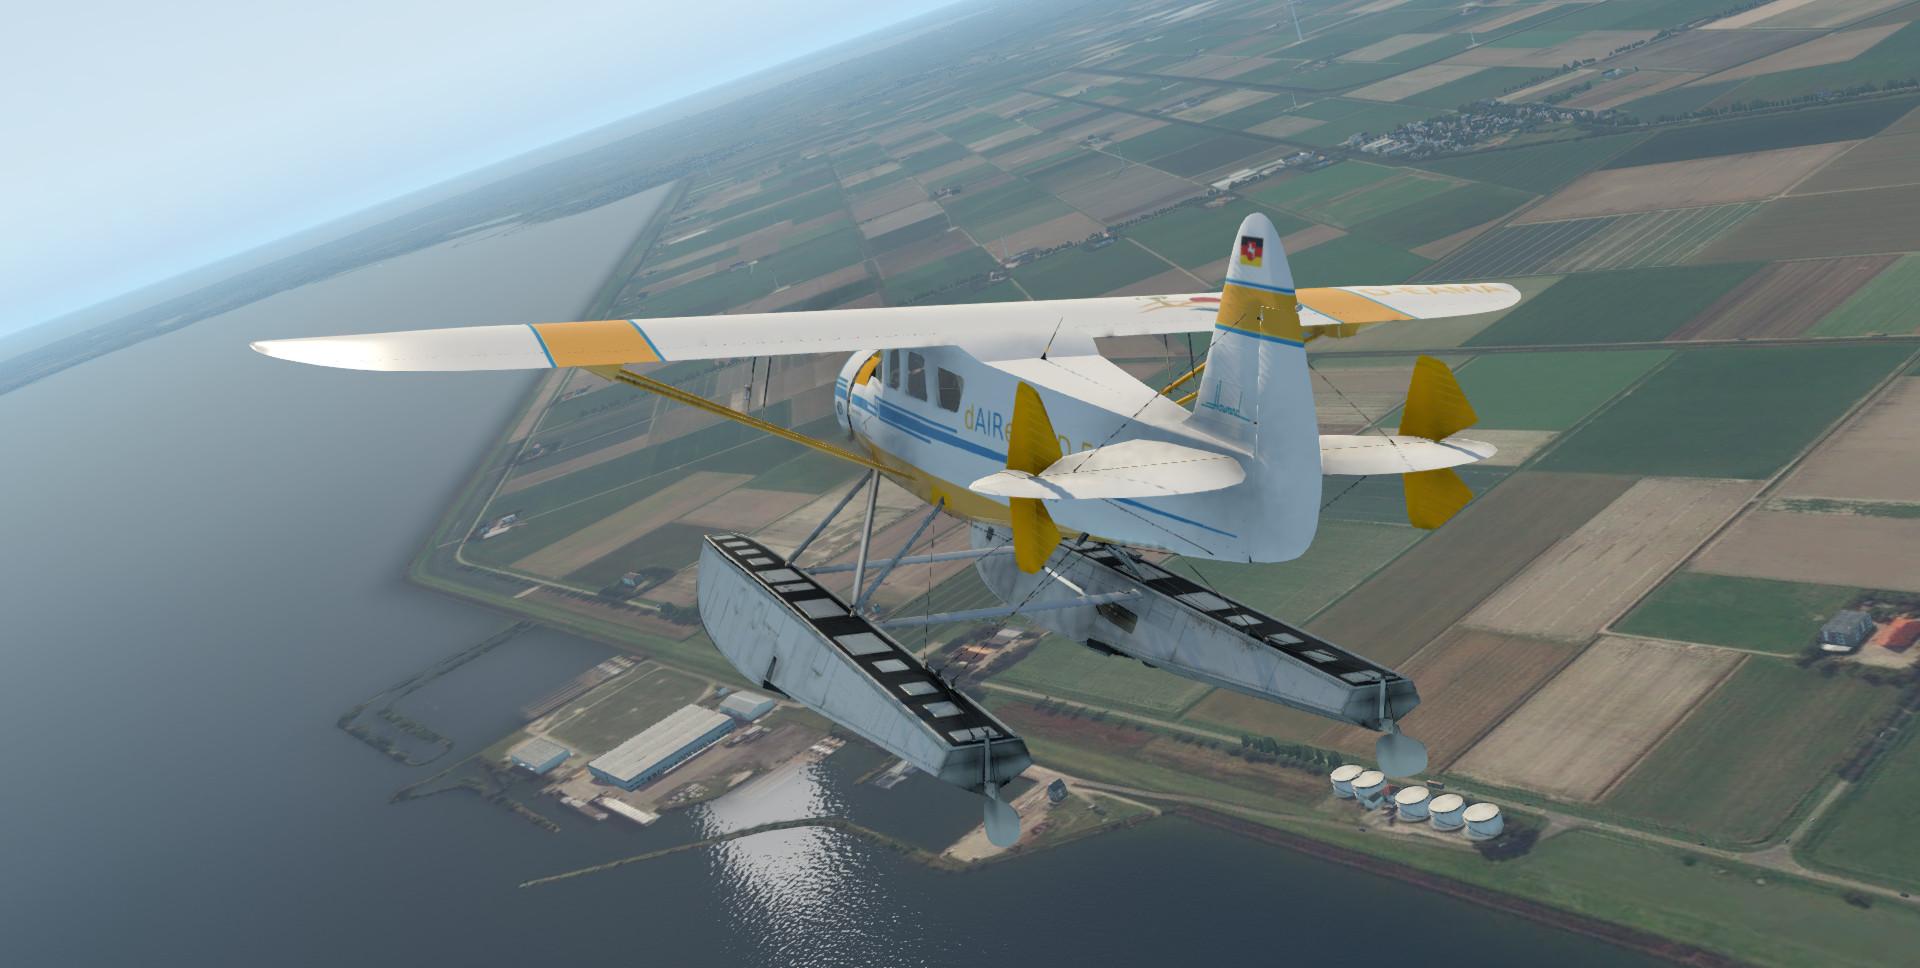 nordseerundflug-039bkk2v.jpg